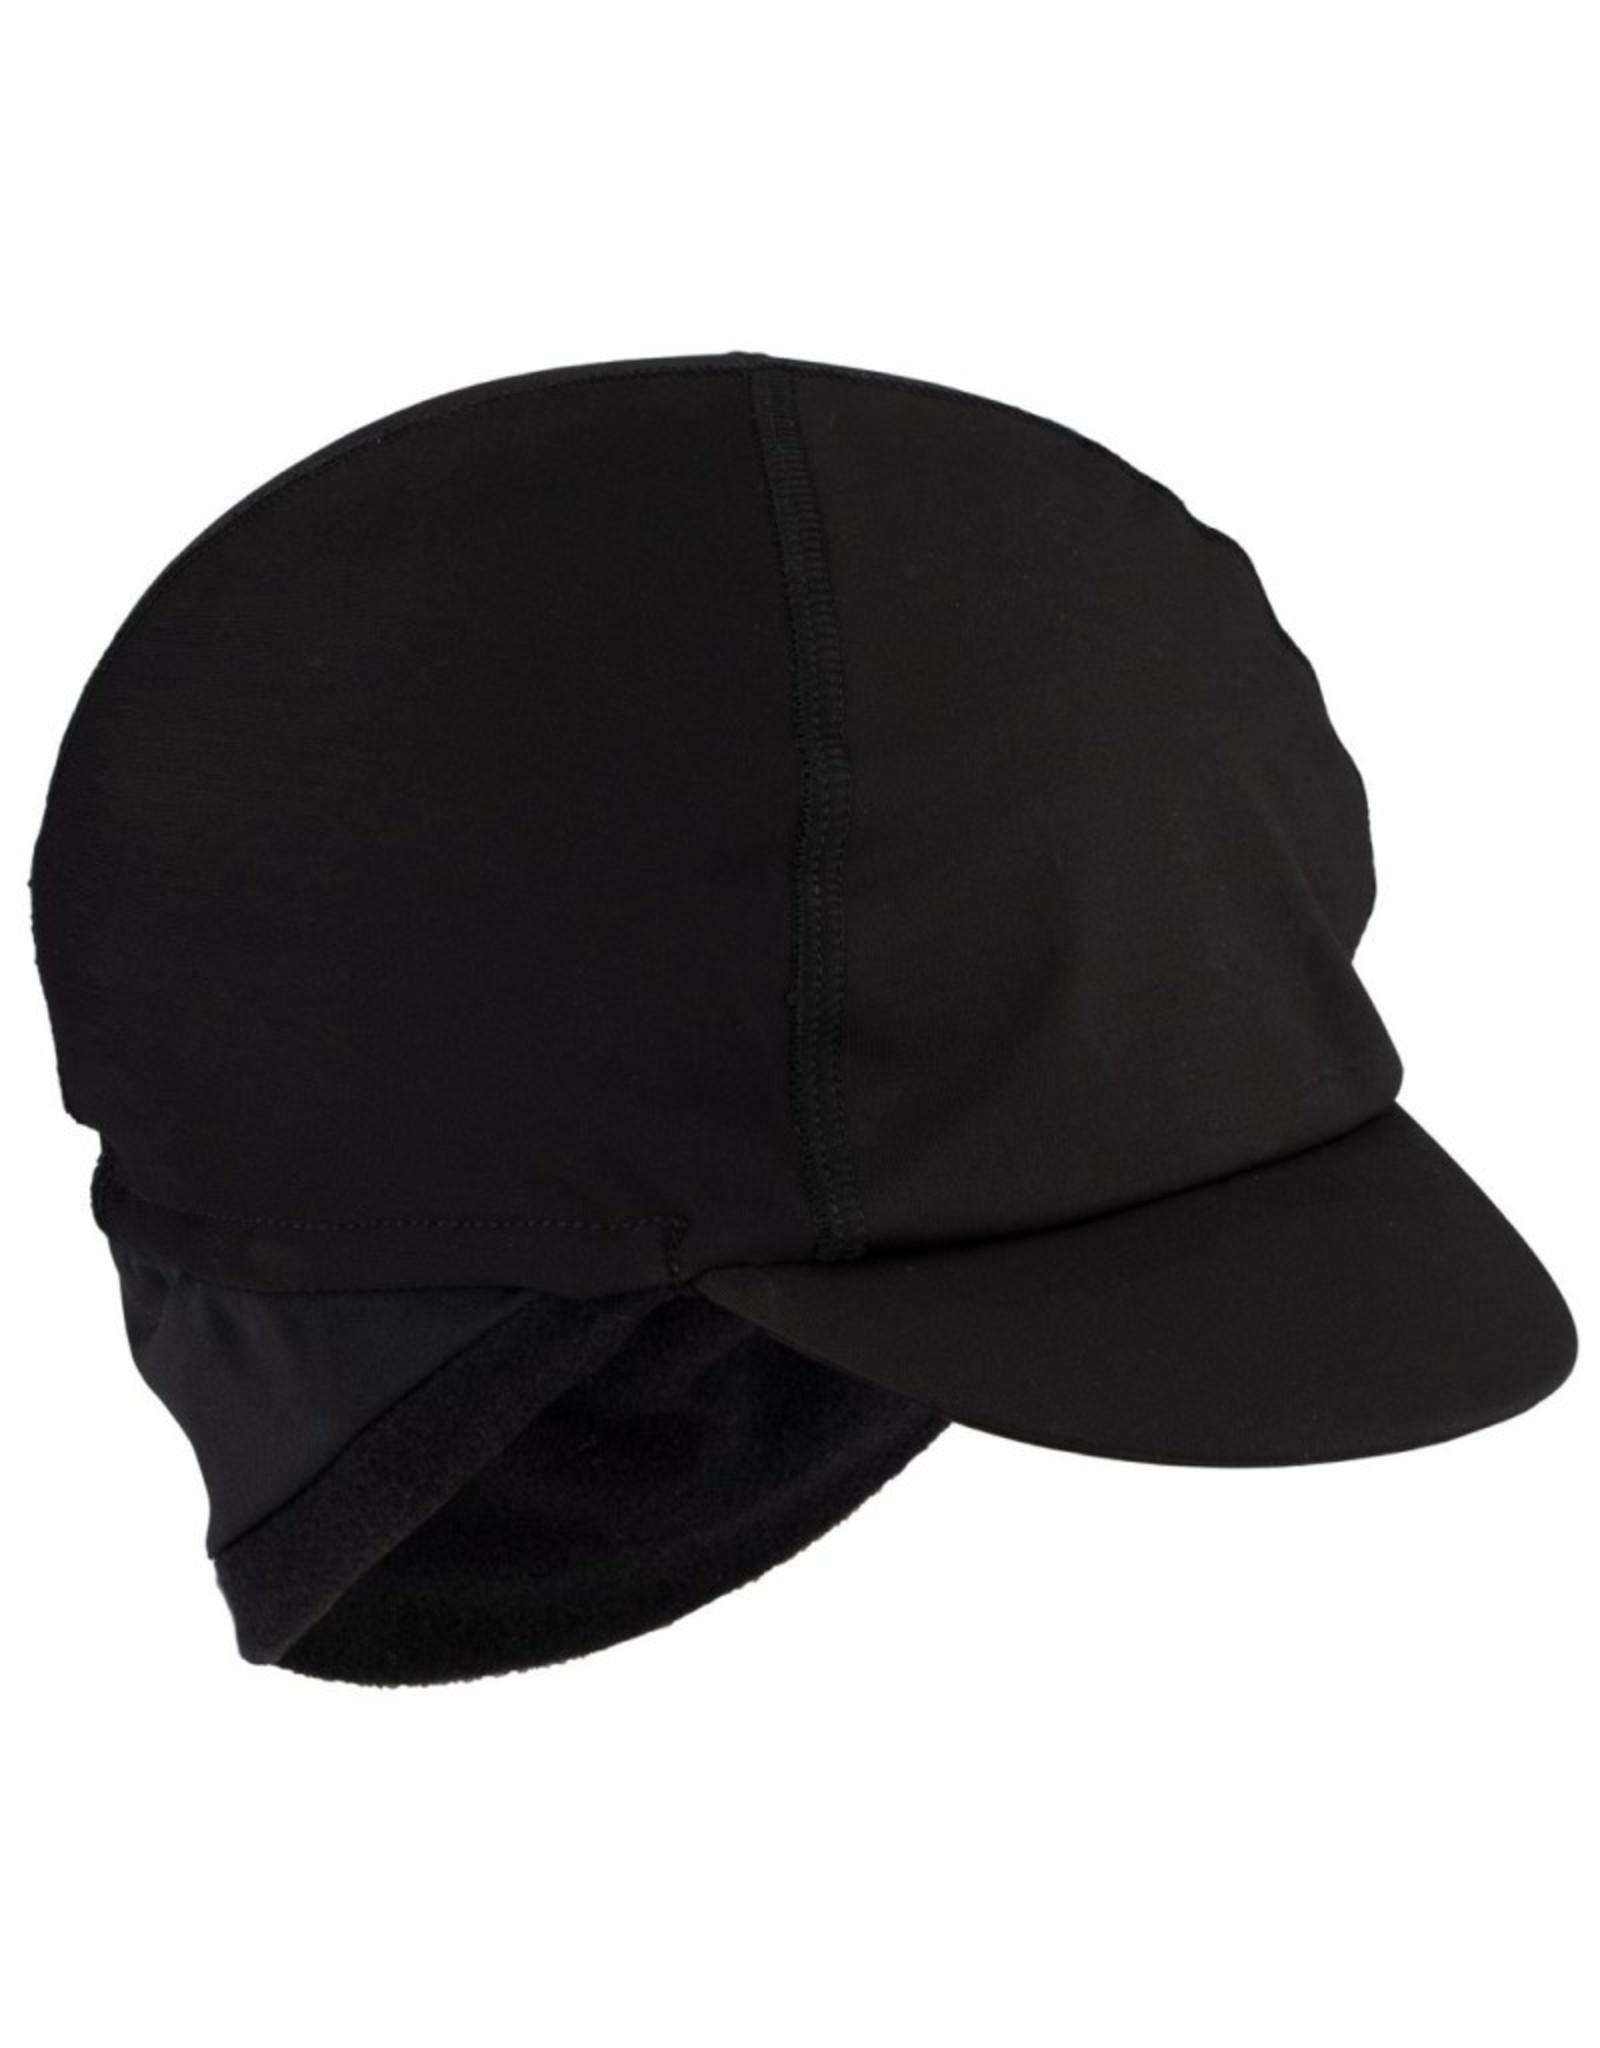 POC Thermal cycling cap - uranium black